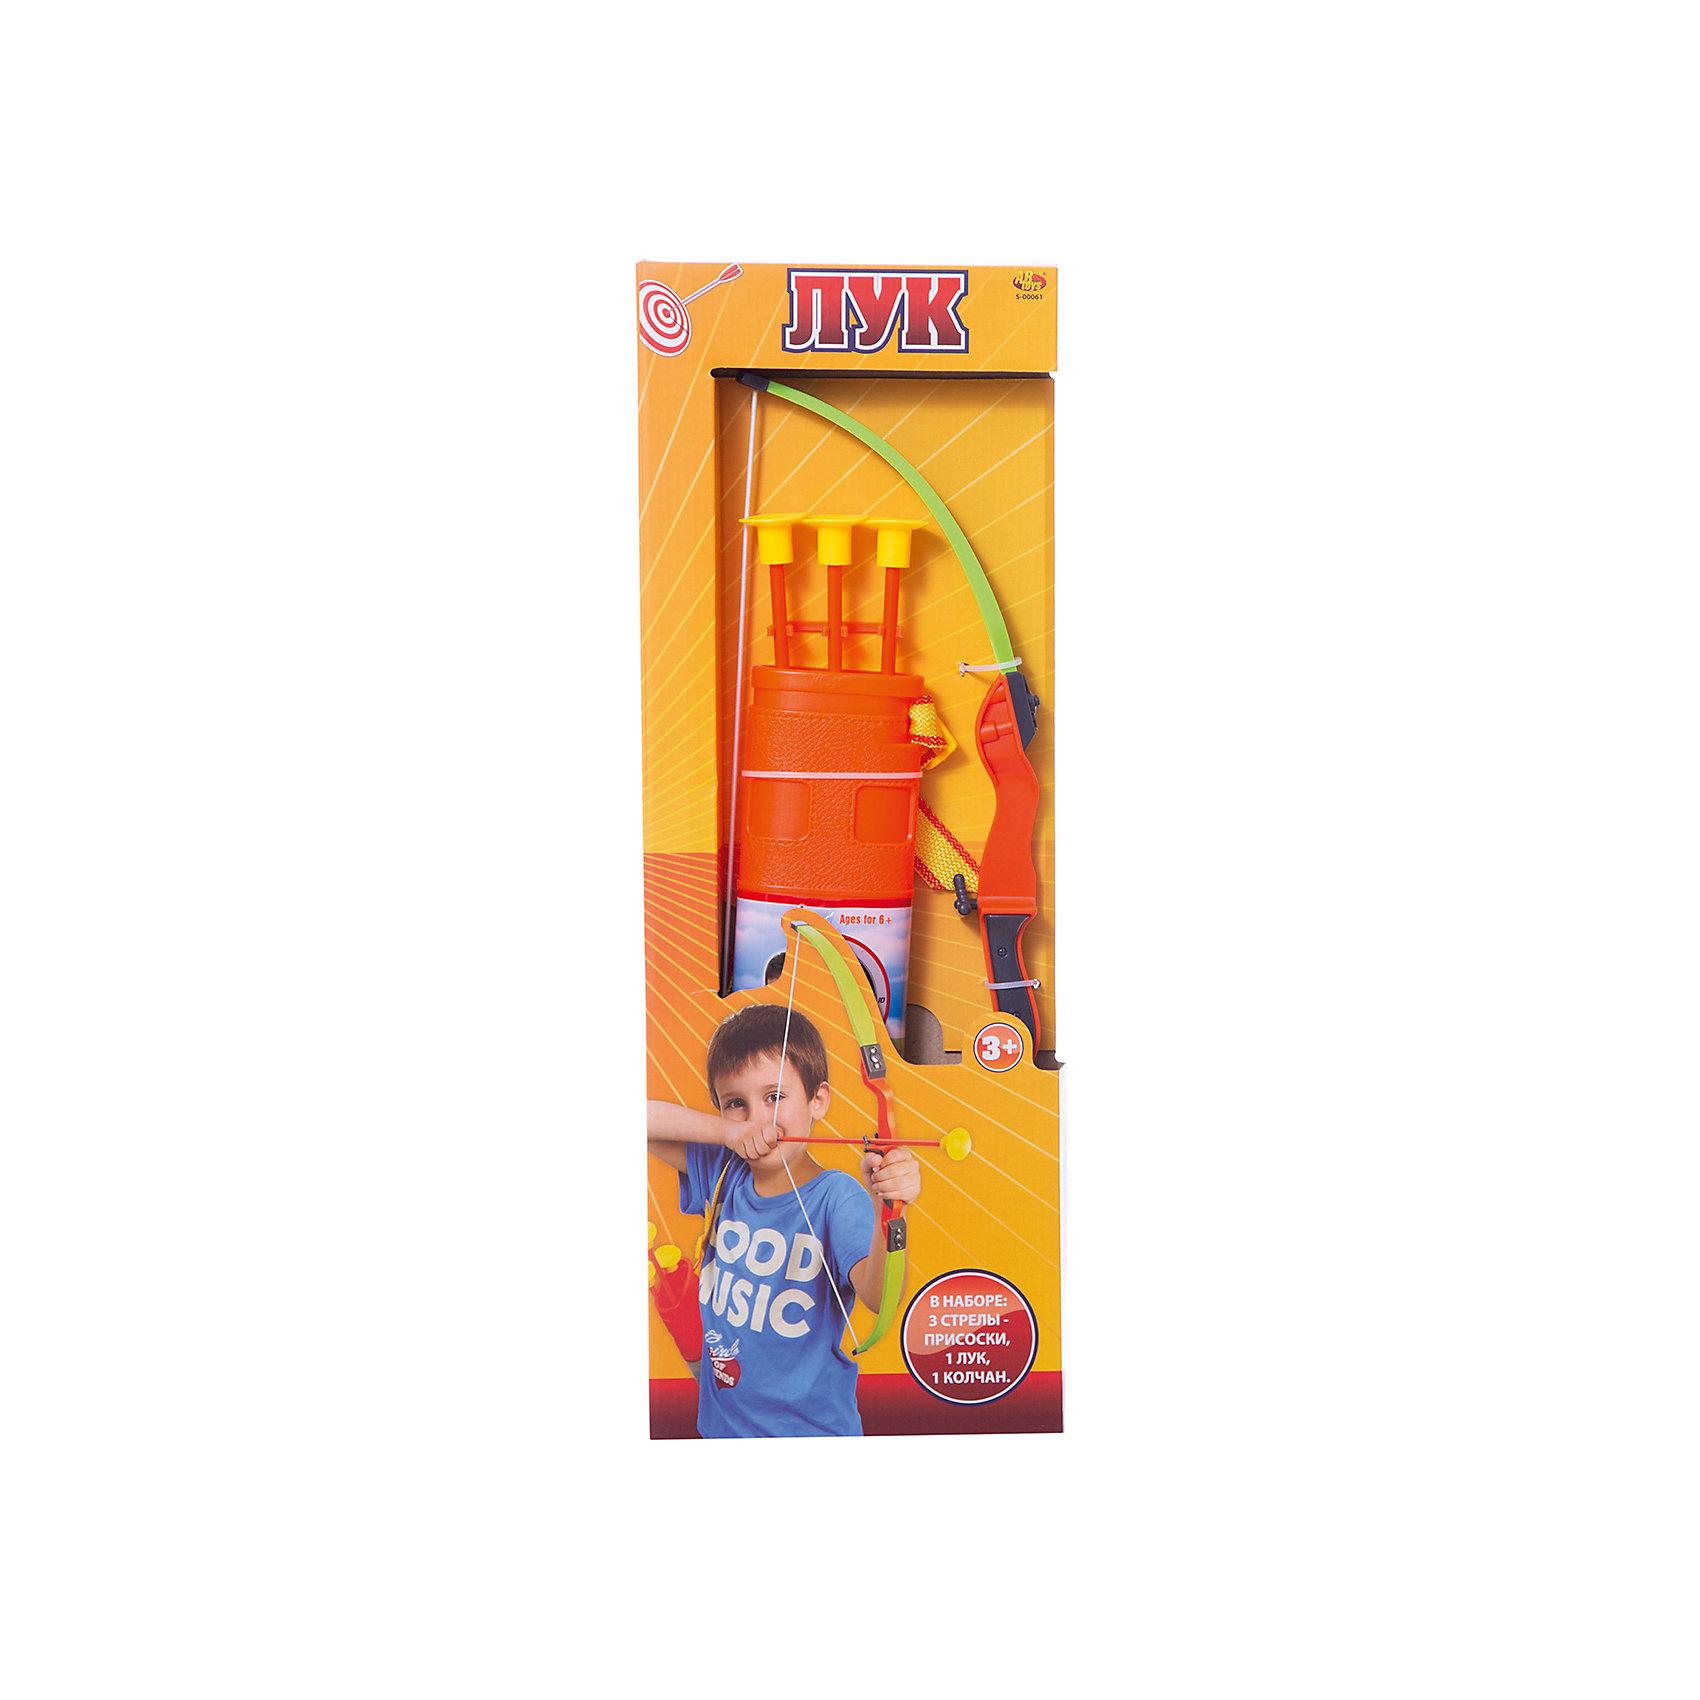 Лук со стрелами на присосках, 3 стрелы, колчан и лук, ABtoysИгровые наборы<br>Лук со стрелами на присосках, в наборе 3 стрелы, колчан и лук, в коробке, 20х57,3х4,3 см<br><br>Ширина мм: 200<br>Глубина мм: 573<br>Высота мм: 43<br>Вес г: 500<br>Возраст от месяцев: 36<br>Возраст до месяцев: 144<br>Пол: Мужской<br>Возраст: Детский<br>SKU: 5500948